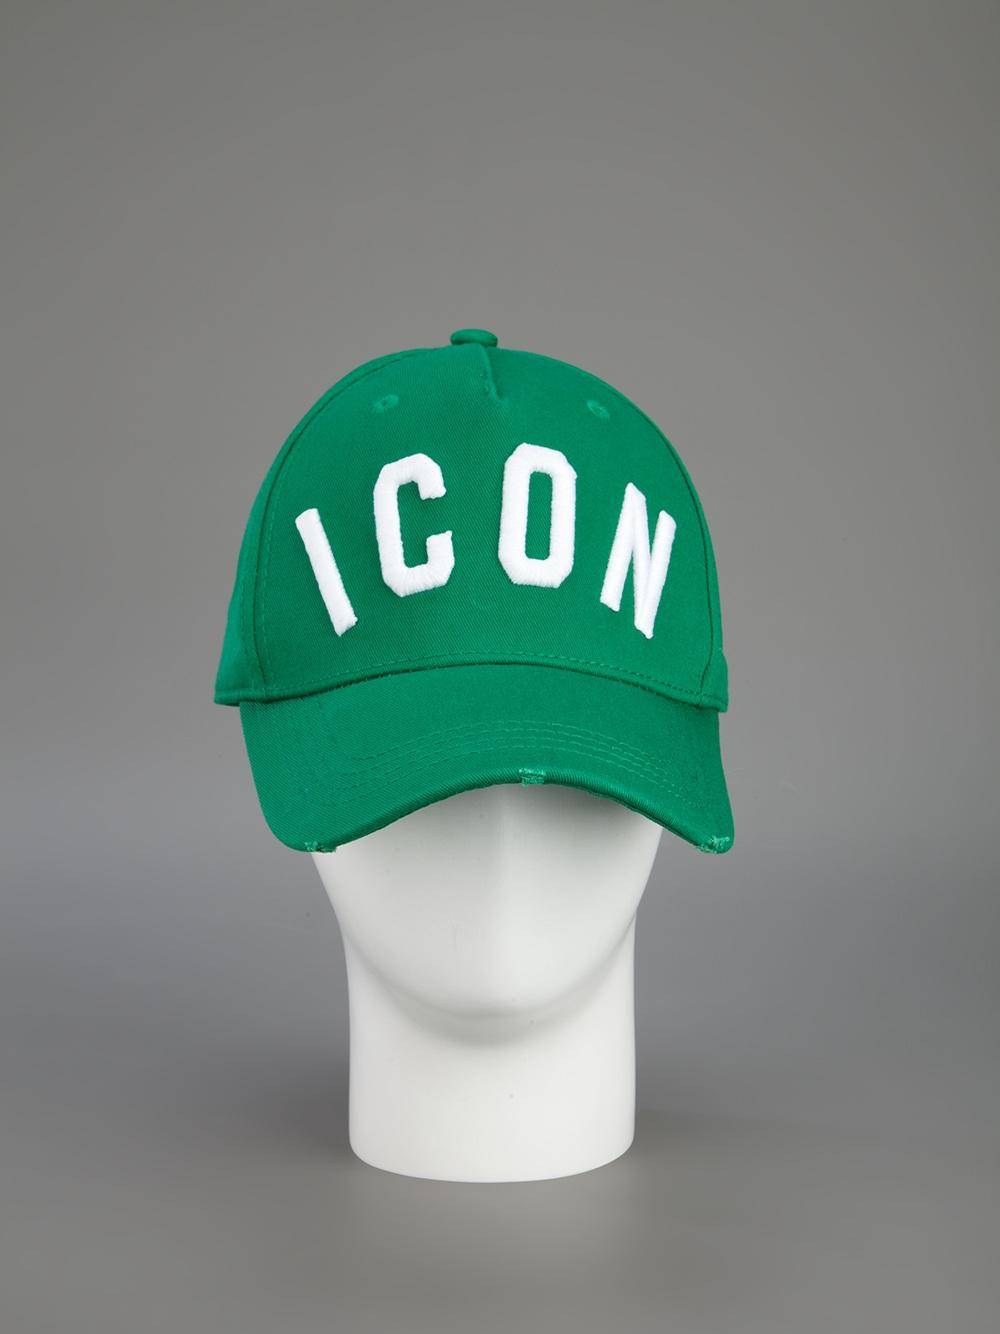 Icon beanie - Green Dsquared2 qWyEwHsqV8